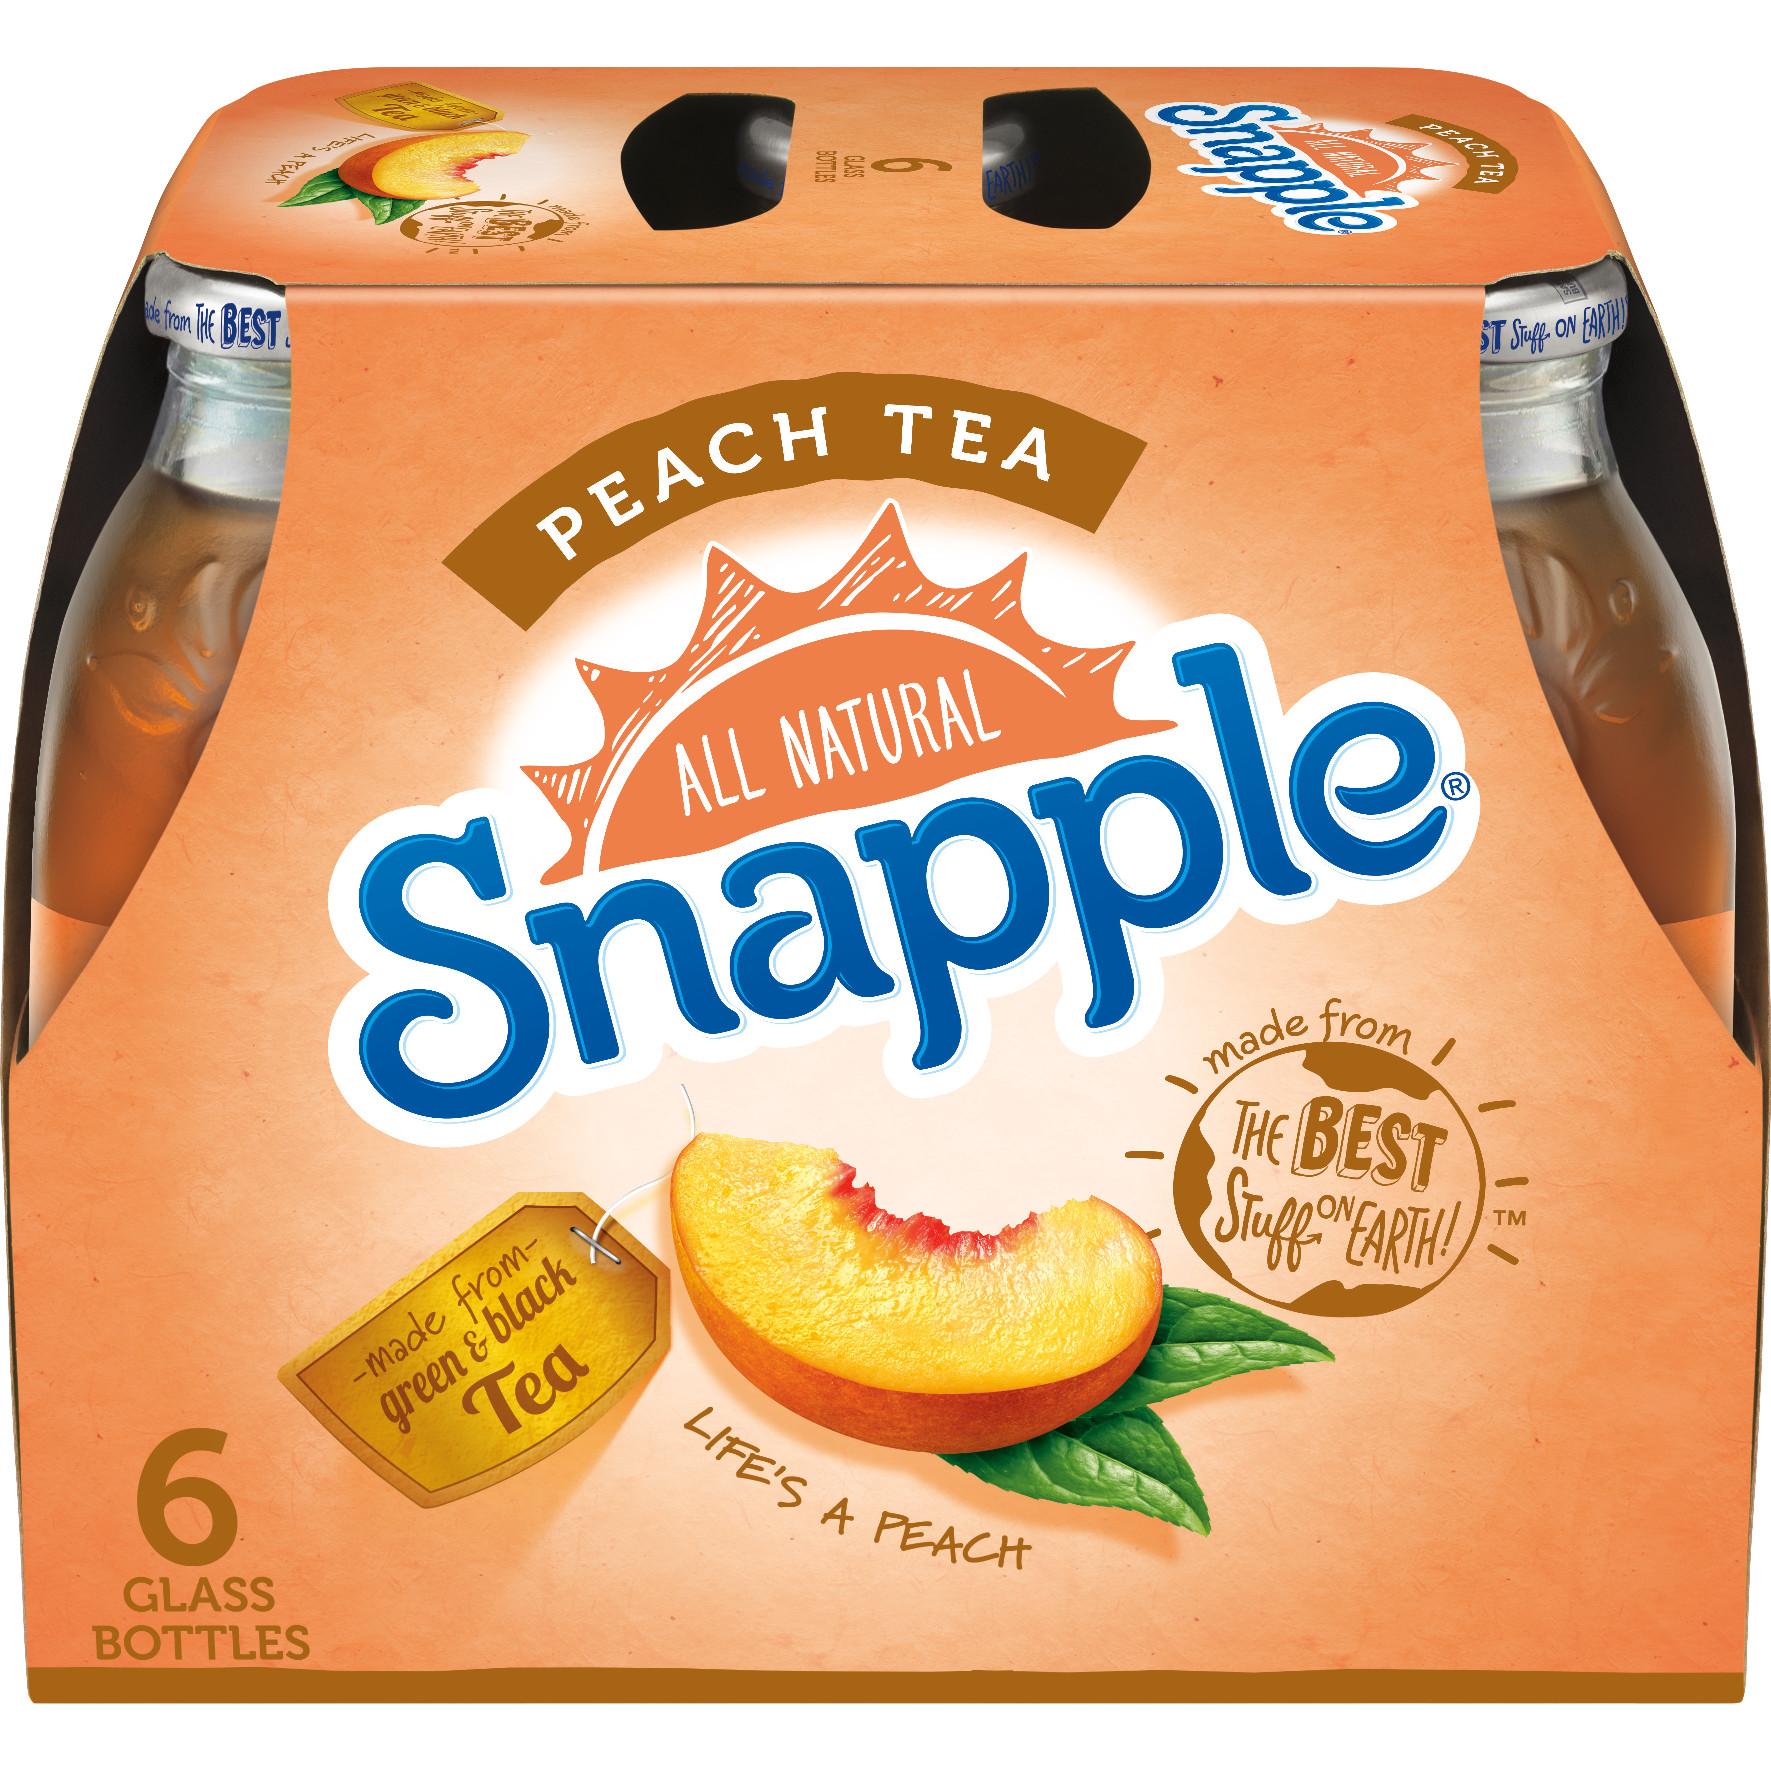 Snapple Peach Tea, 16 fl oz, 6 pack